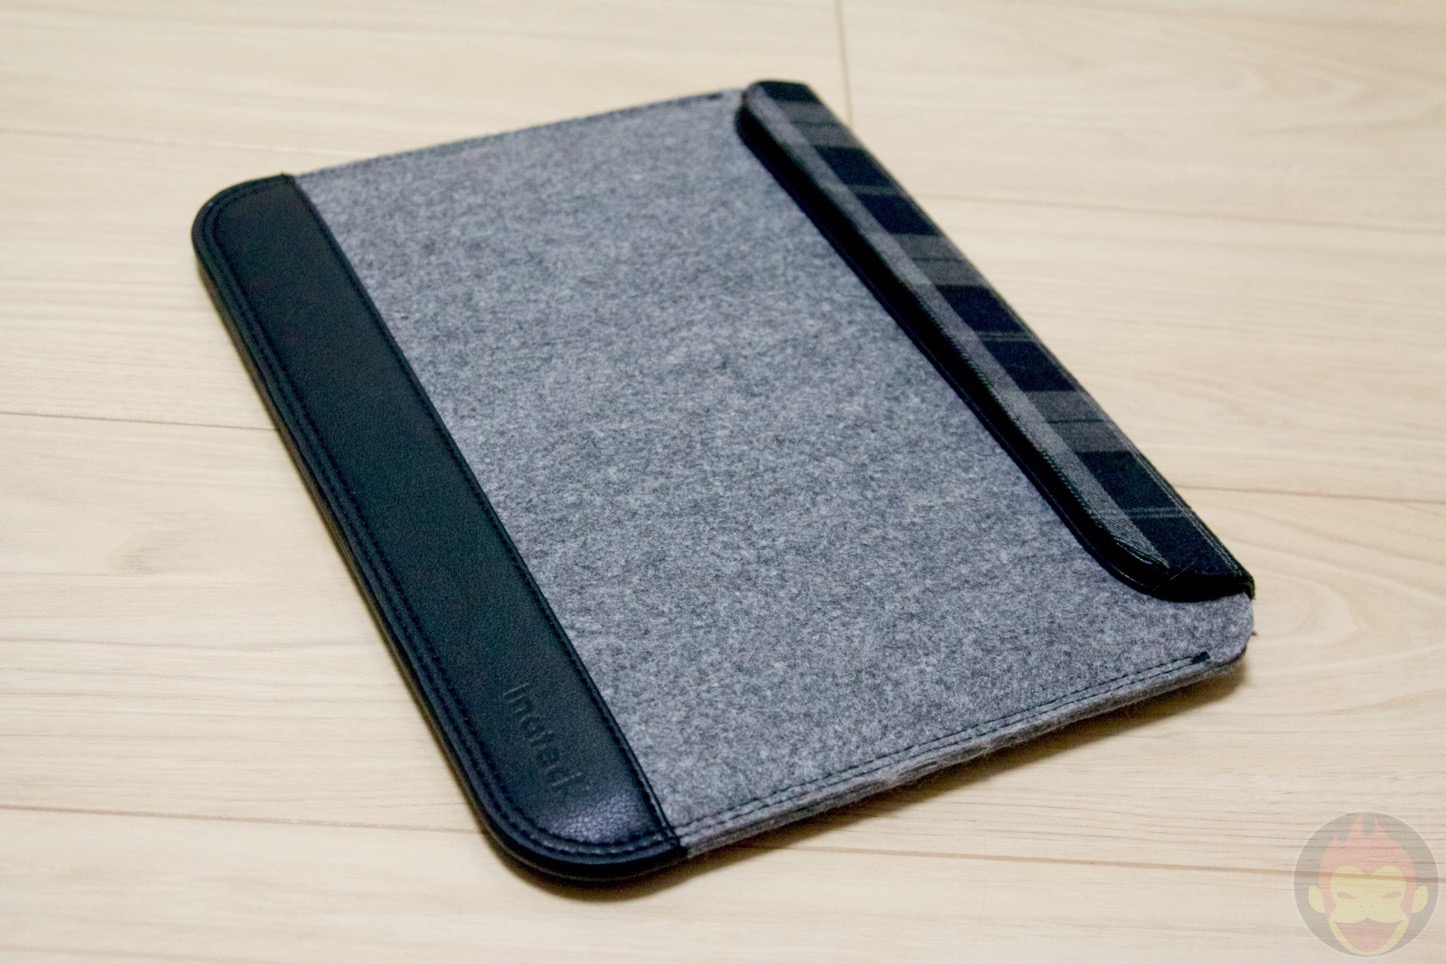 Inateck-12inch-MacBook-Case-008.jpg